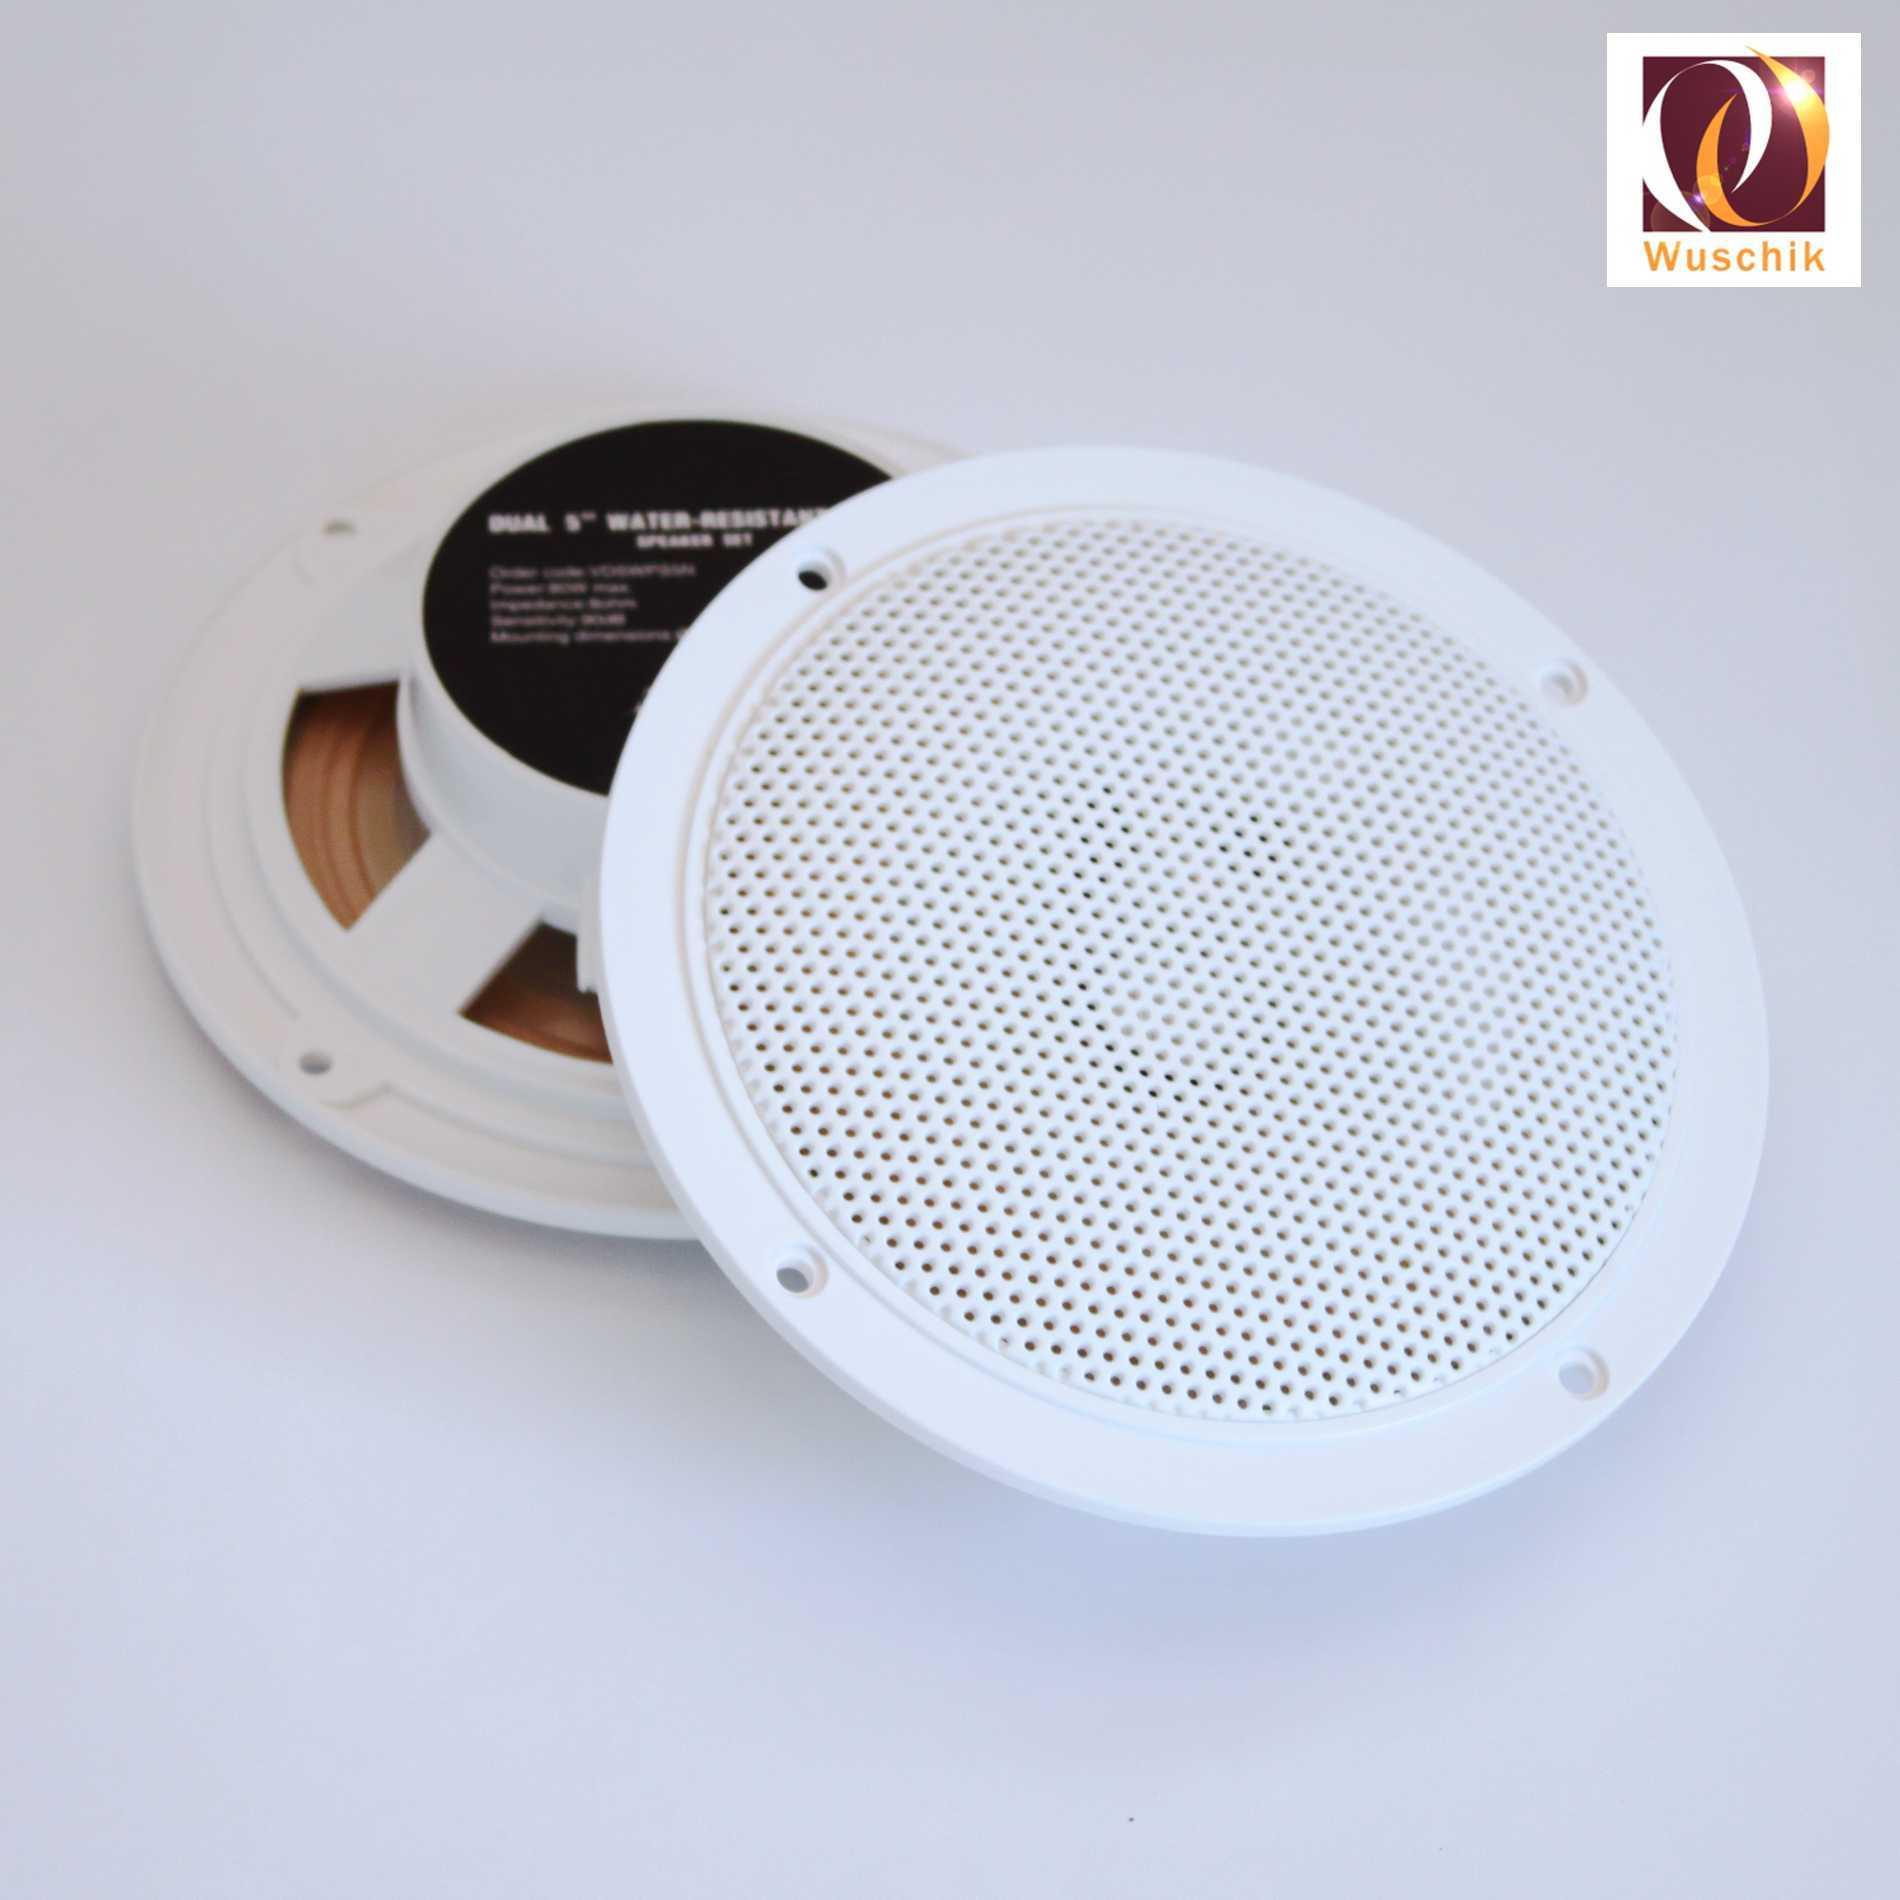 Set Stereo Lautsprecher Einbauboxen Water Resistant 5 Wellness